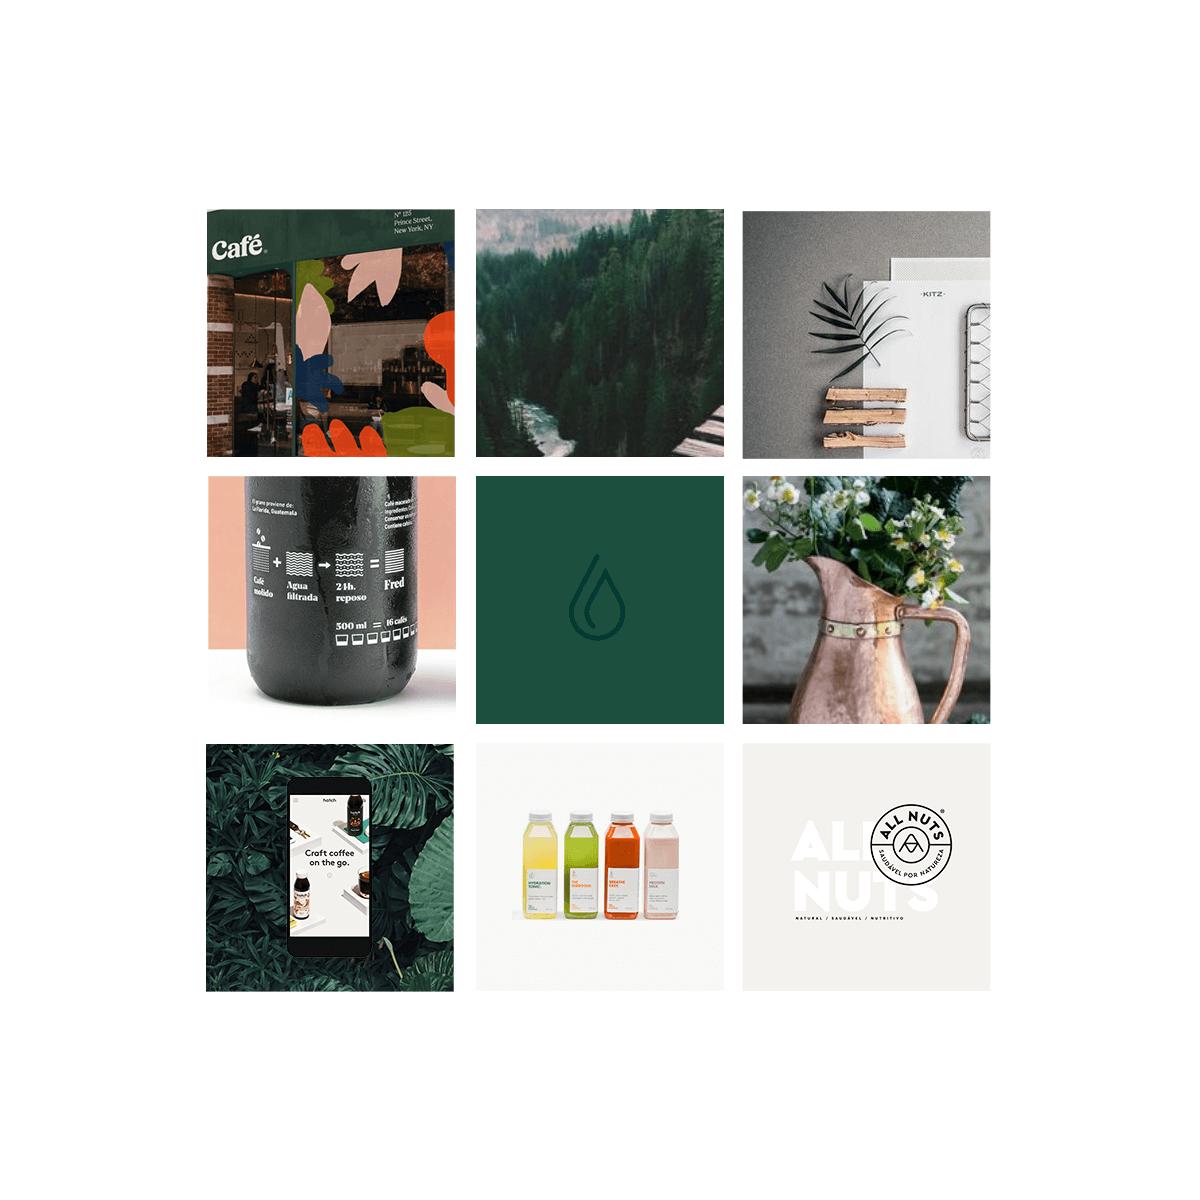 Copperheart-Creative-Branding-Leaf-Alchemy-CBD-Product-Brand-Nashville-Moodboard-Inspiration-Design.jpg